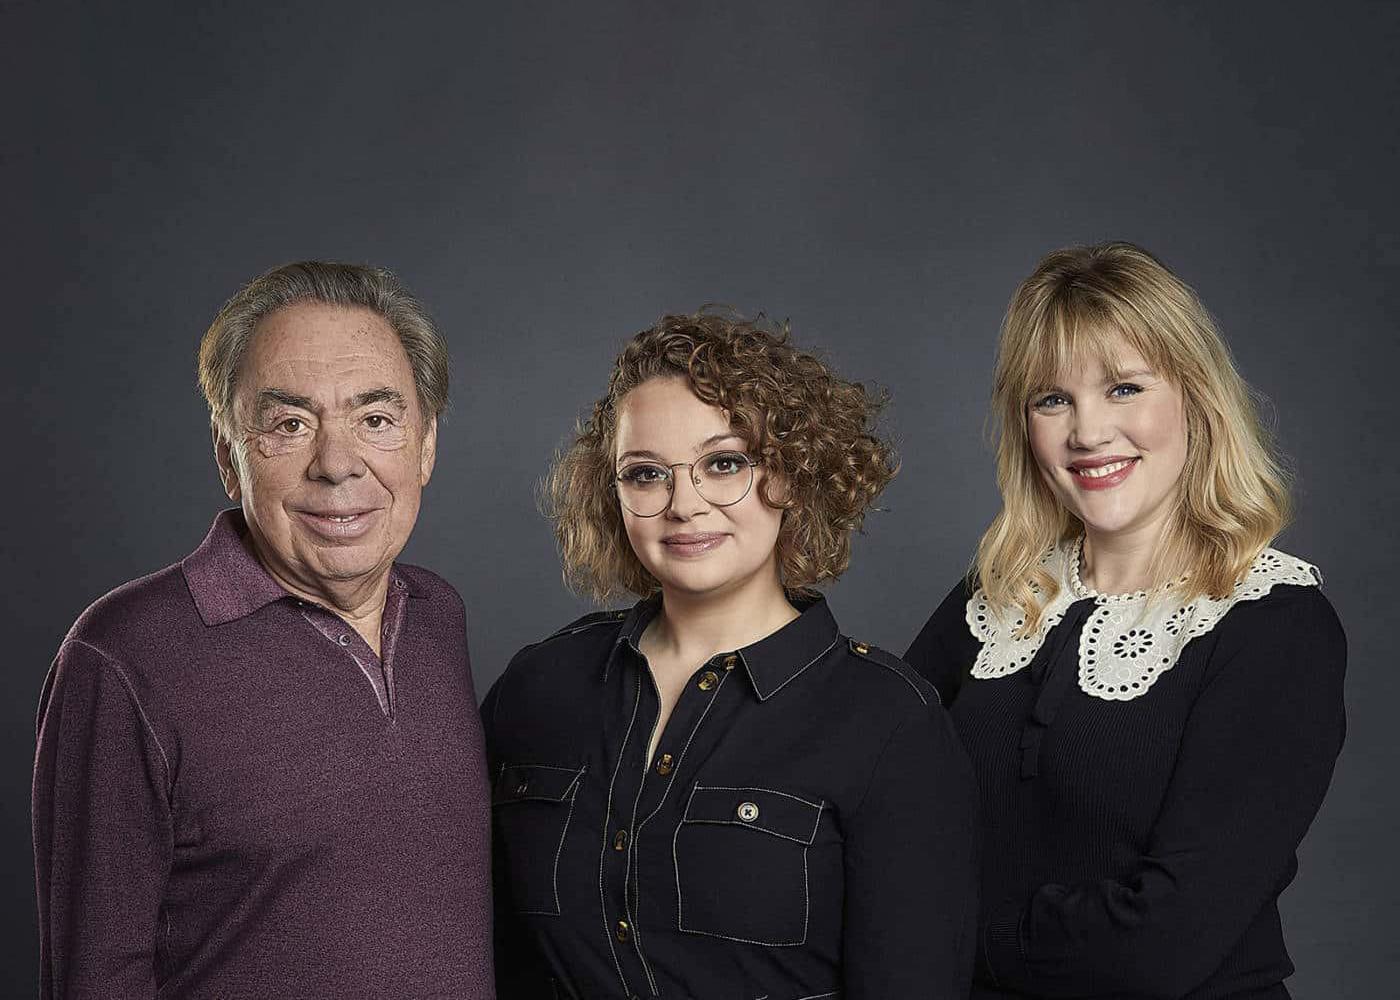 Cast of Andrew Lloyd Webber's Cinderella The Musical.